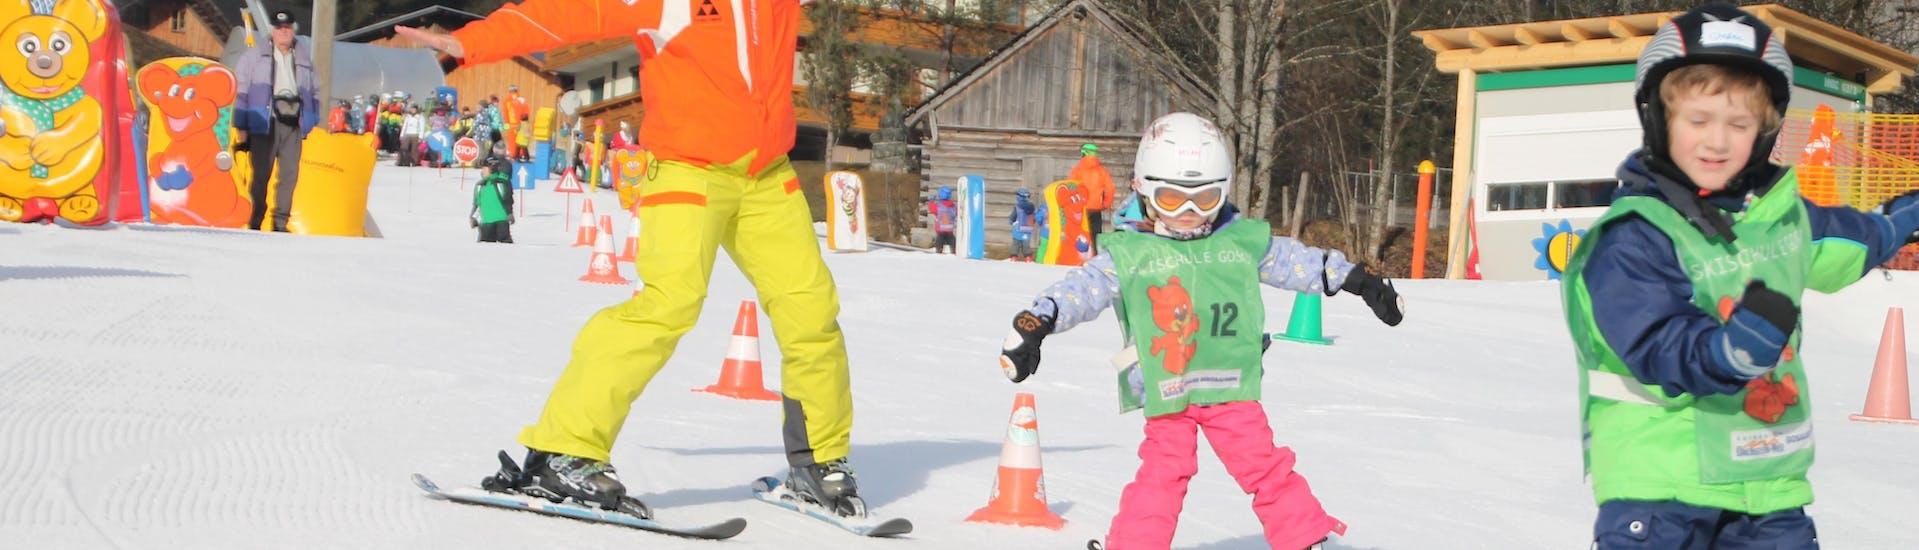 "Ski Instructor Private ""Super 3"" for Kids  avec Skischule Gosau - Hero image"